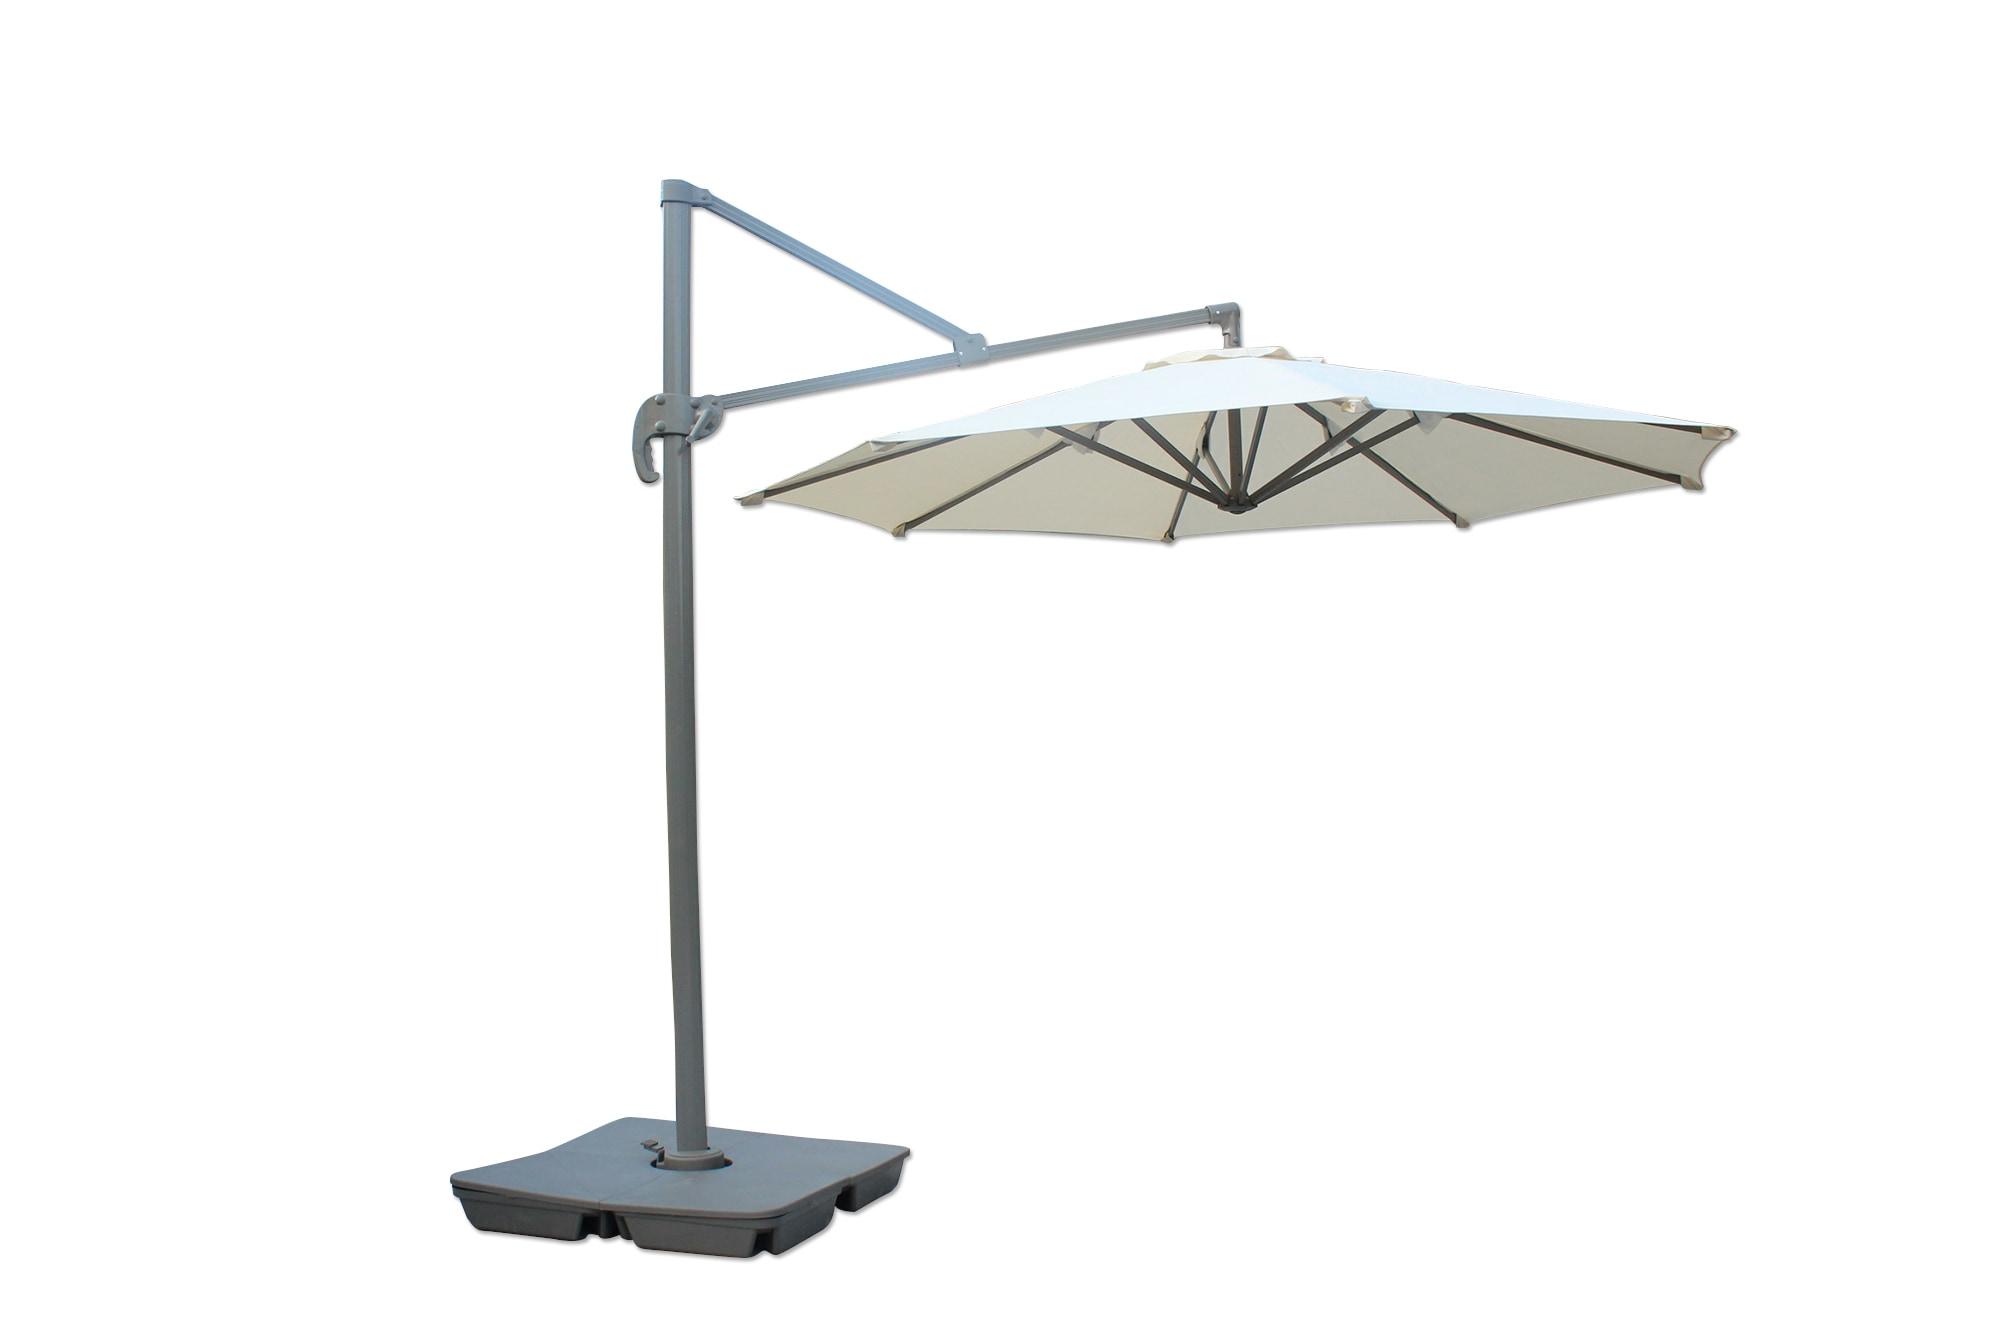 10 ft Round Offset Roma Umbrella - Taupe Shade & Cooling Offset Patio Umbrellas 0